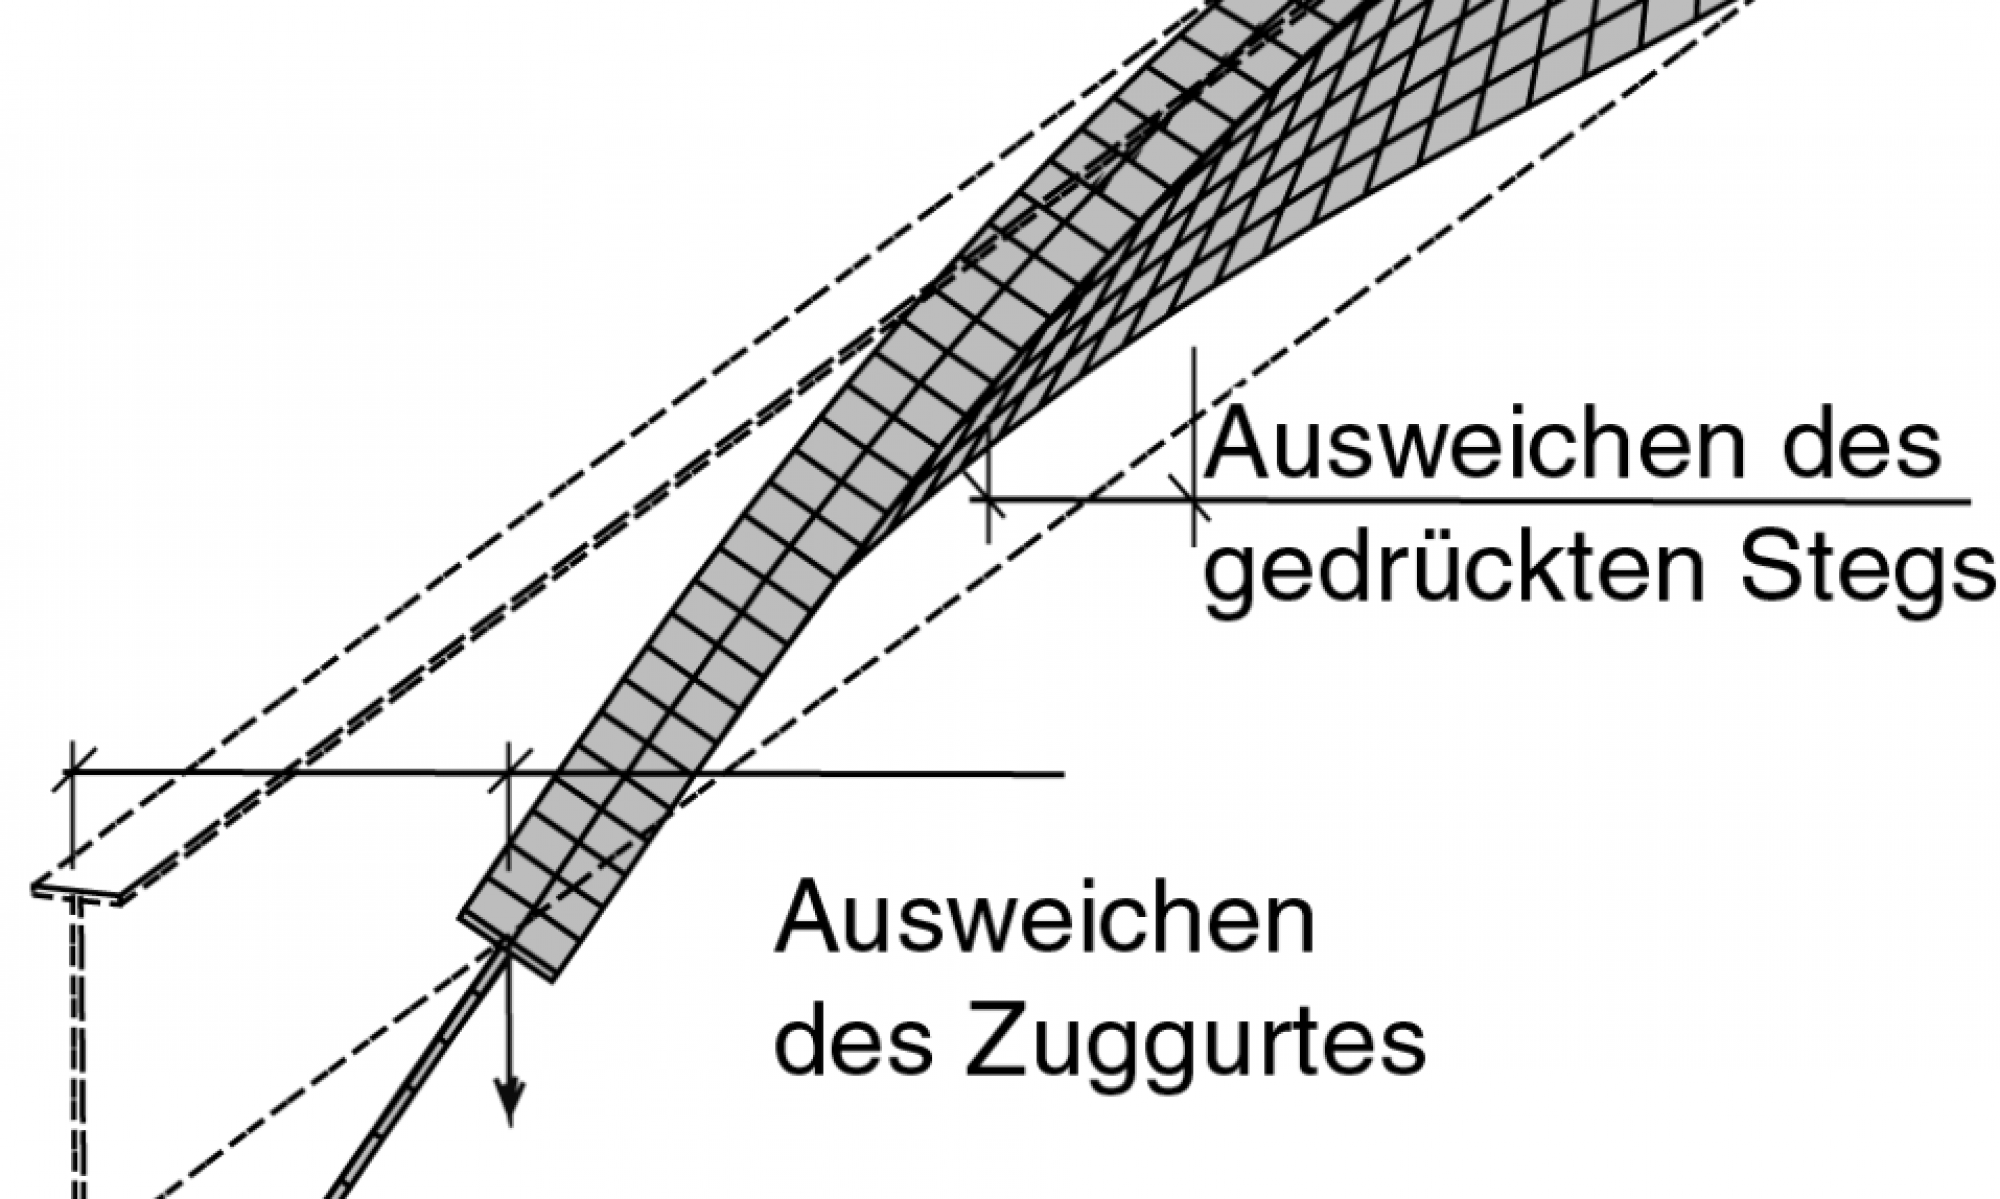 Ingenieur Dr. Smida GmbH